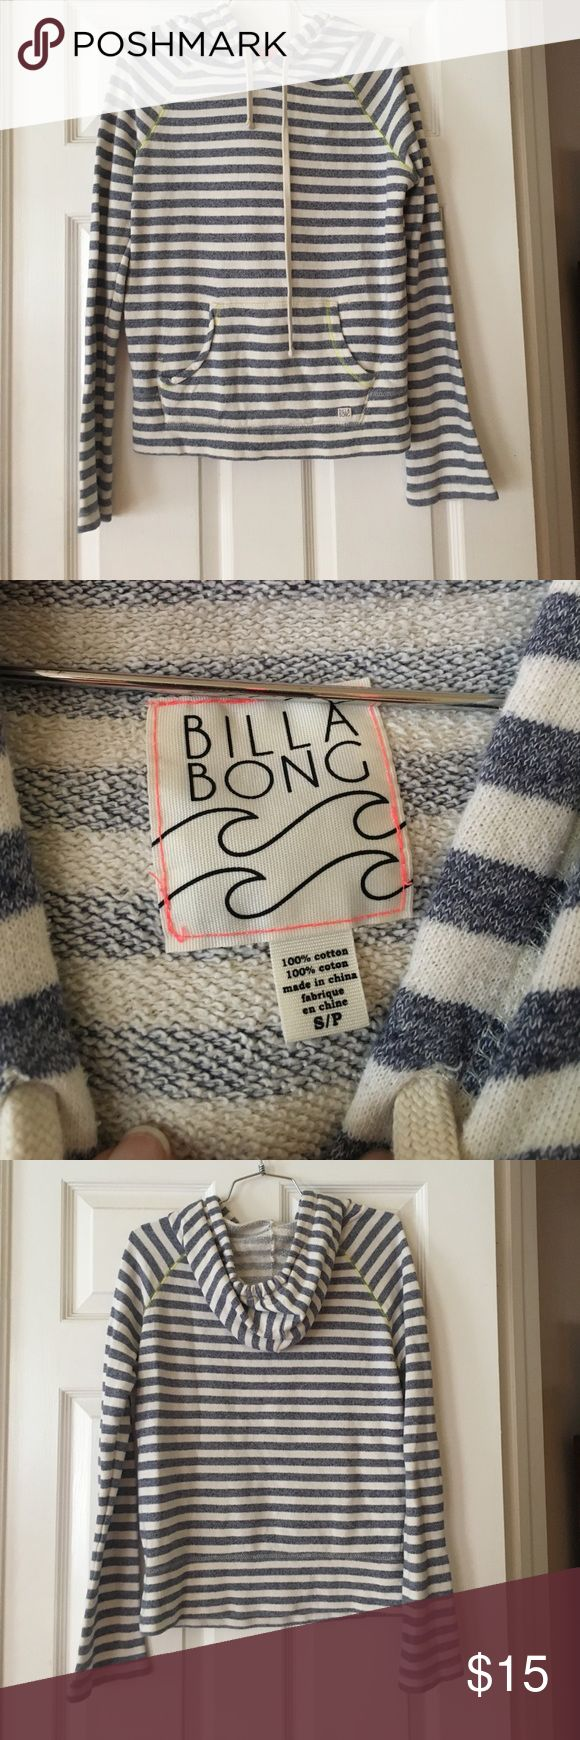 Billabong blue and white stripped sweatshirt Billabong blue and white stripped sweatshirt size s Billabong Tops Sweatshirts & Hoodies